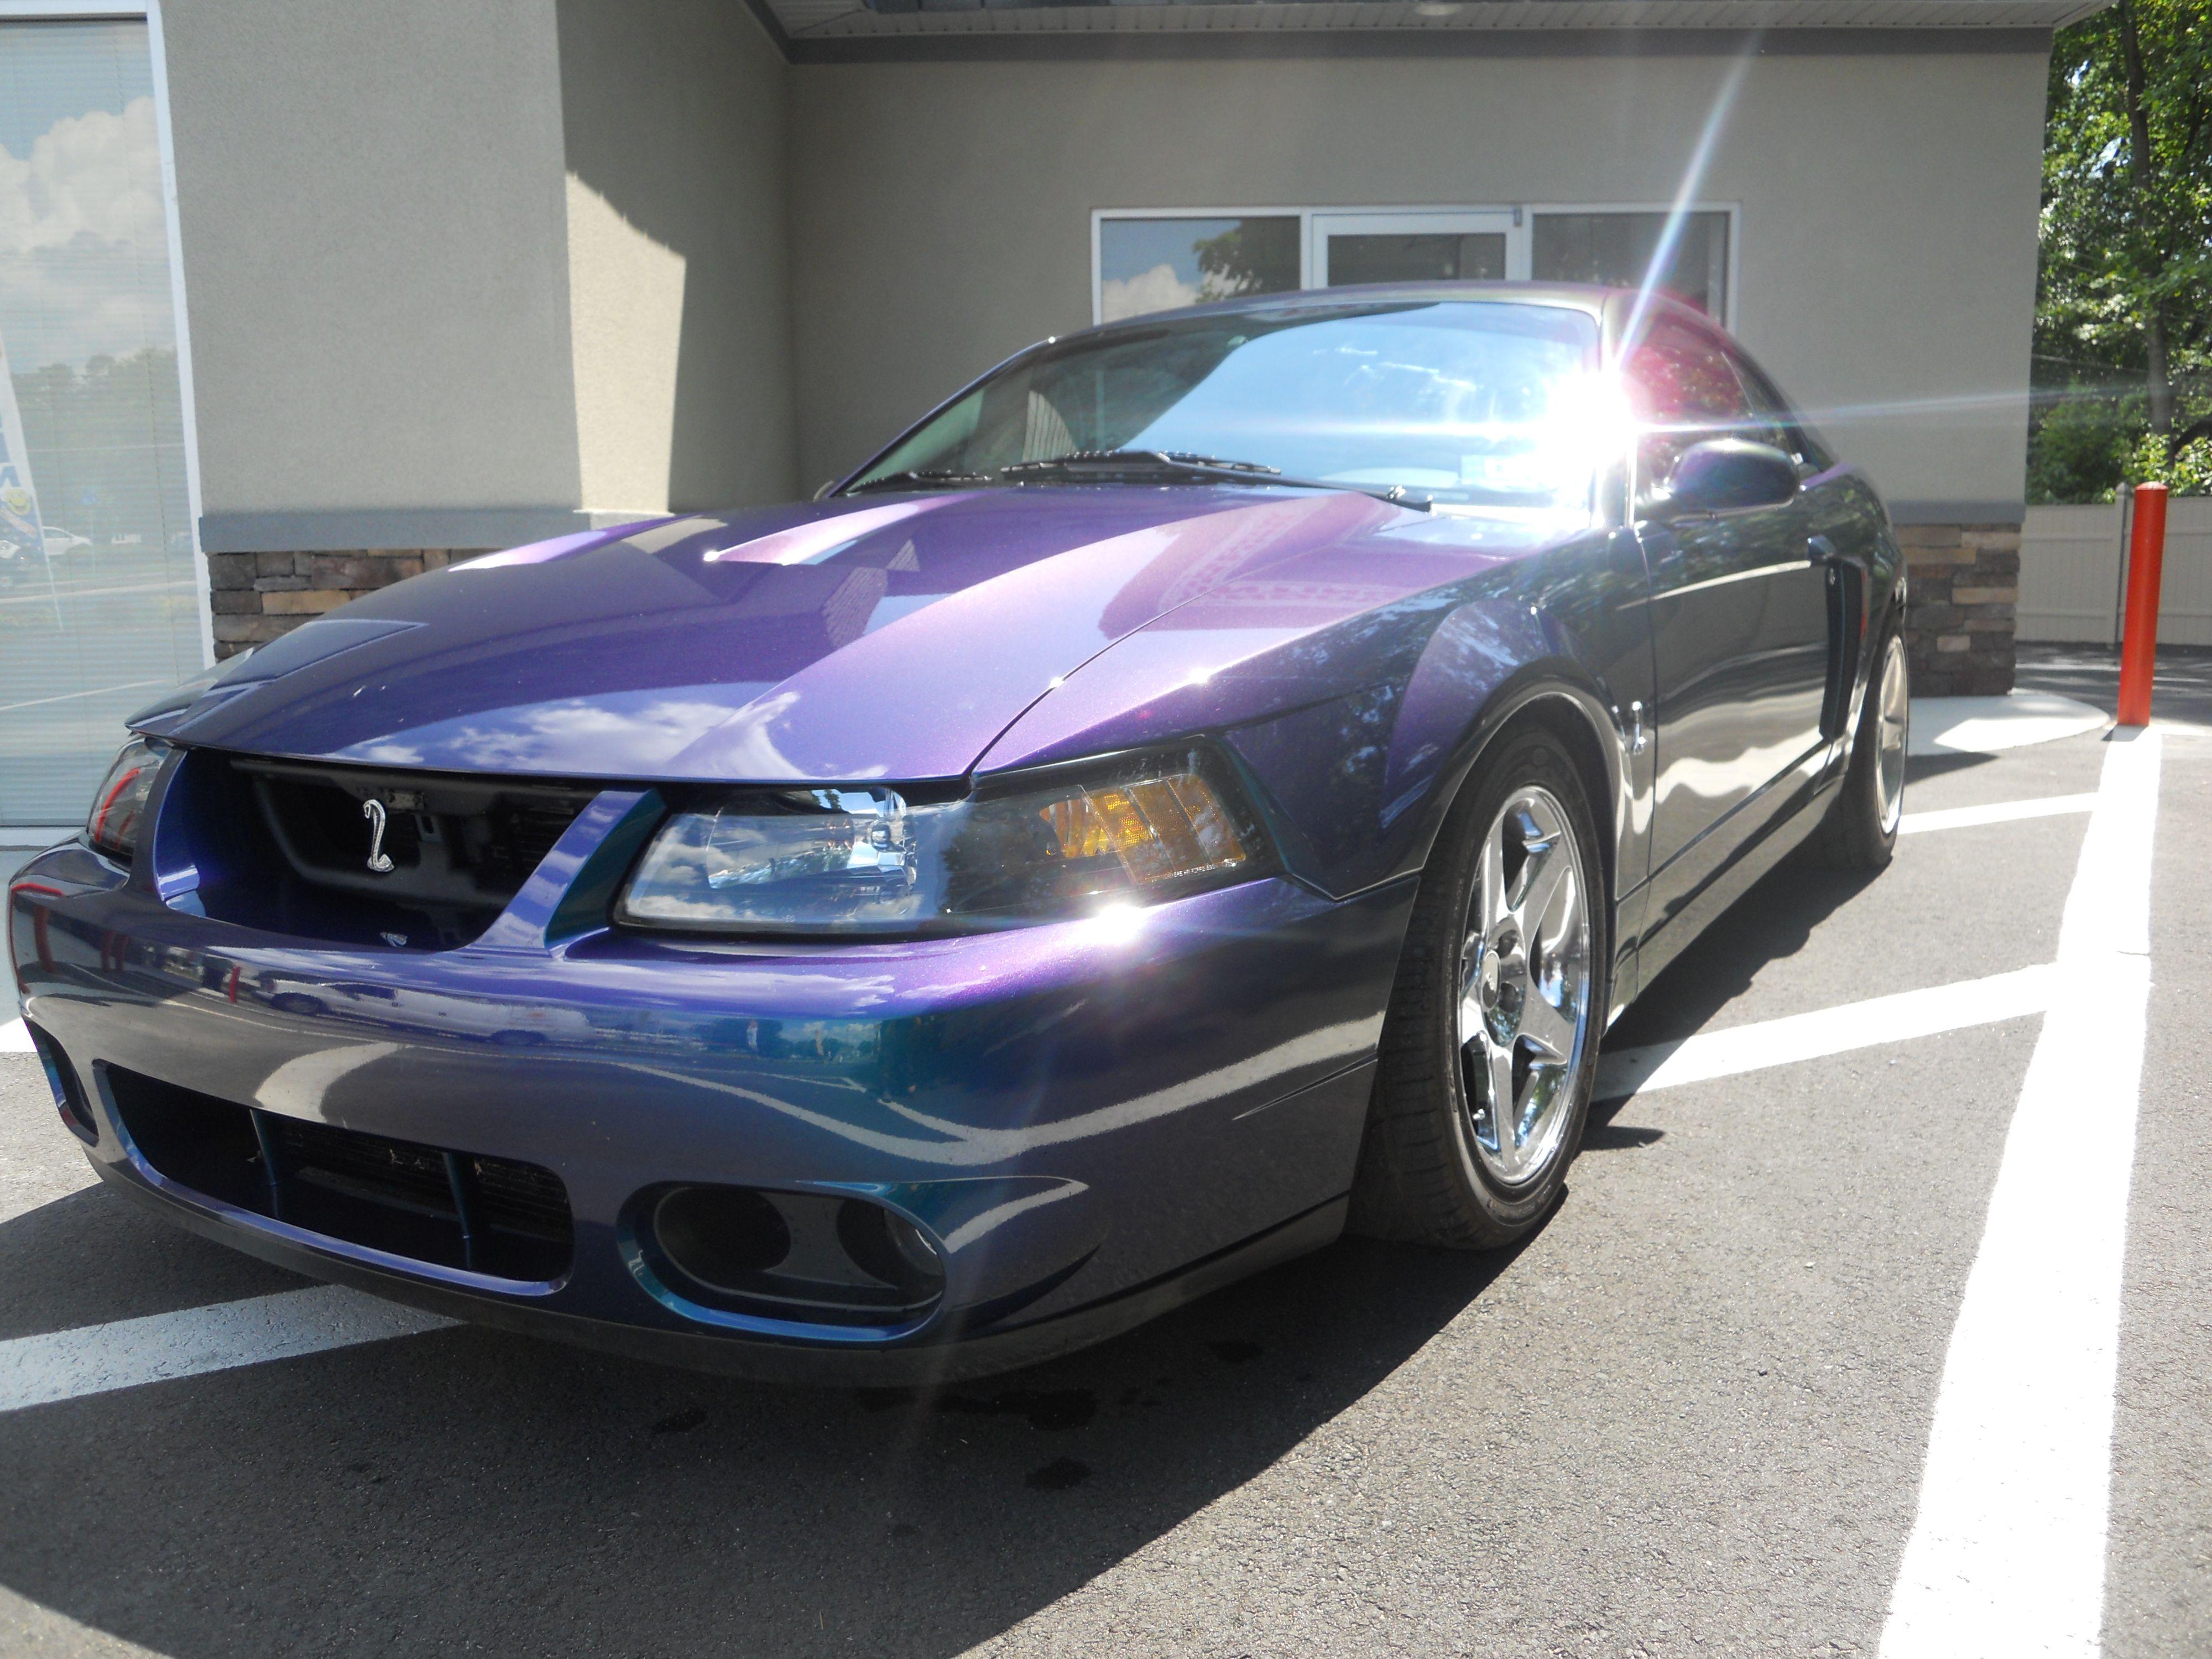 100+ 2004 Mystic Cobra Saleen Wheels – yasminroohi